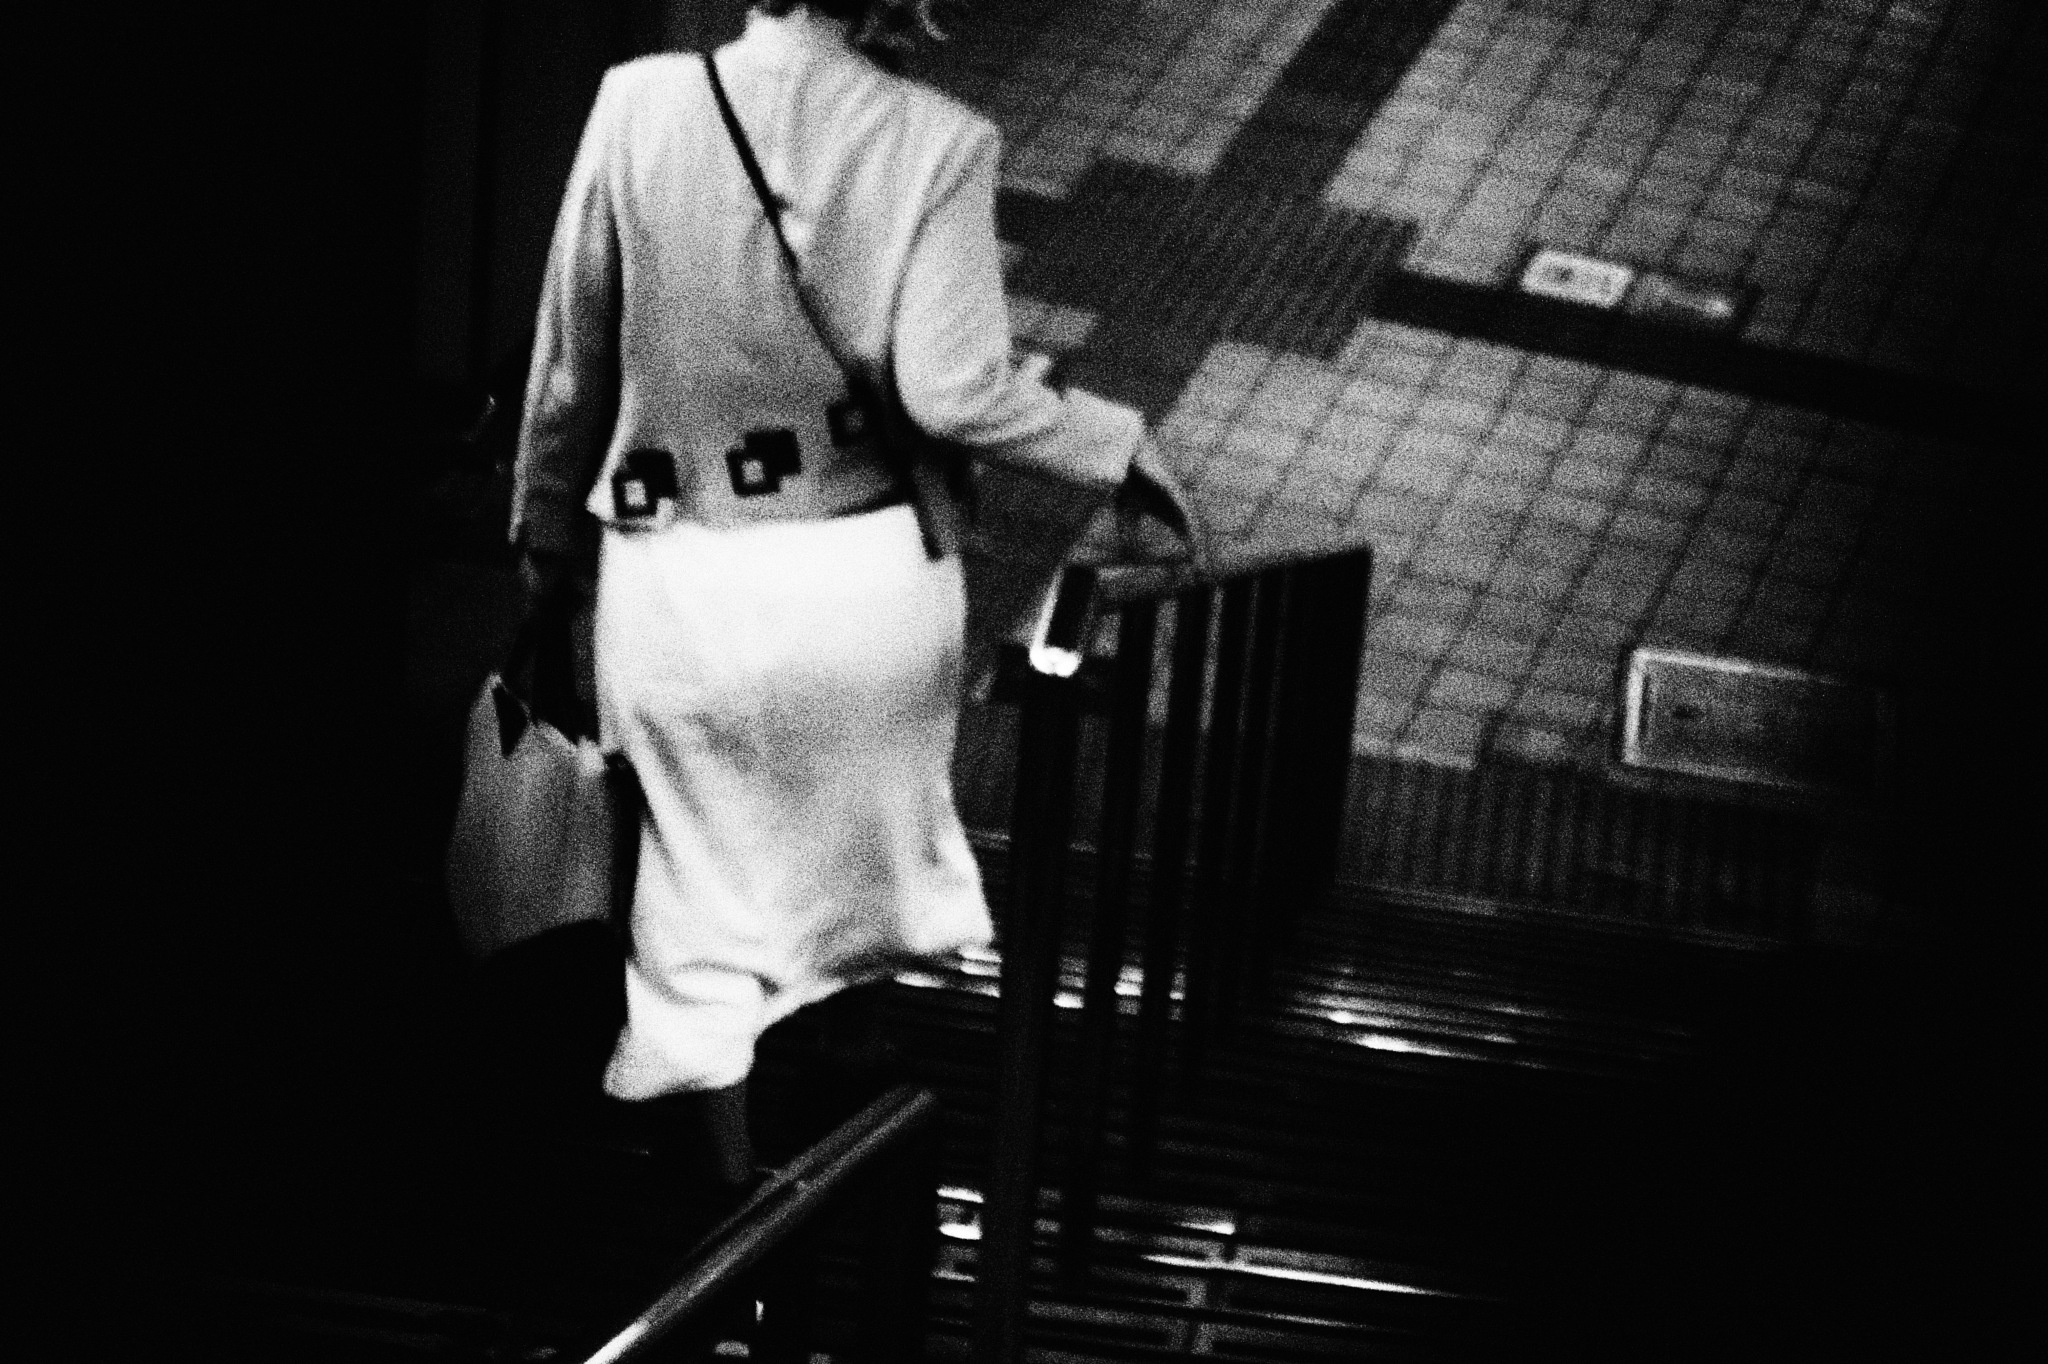 One Day History 59 by Hitoshi Matsumoto